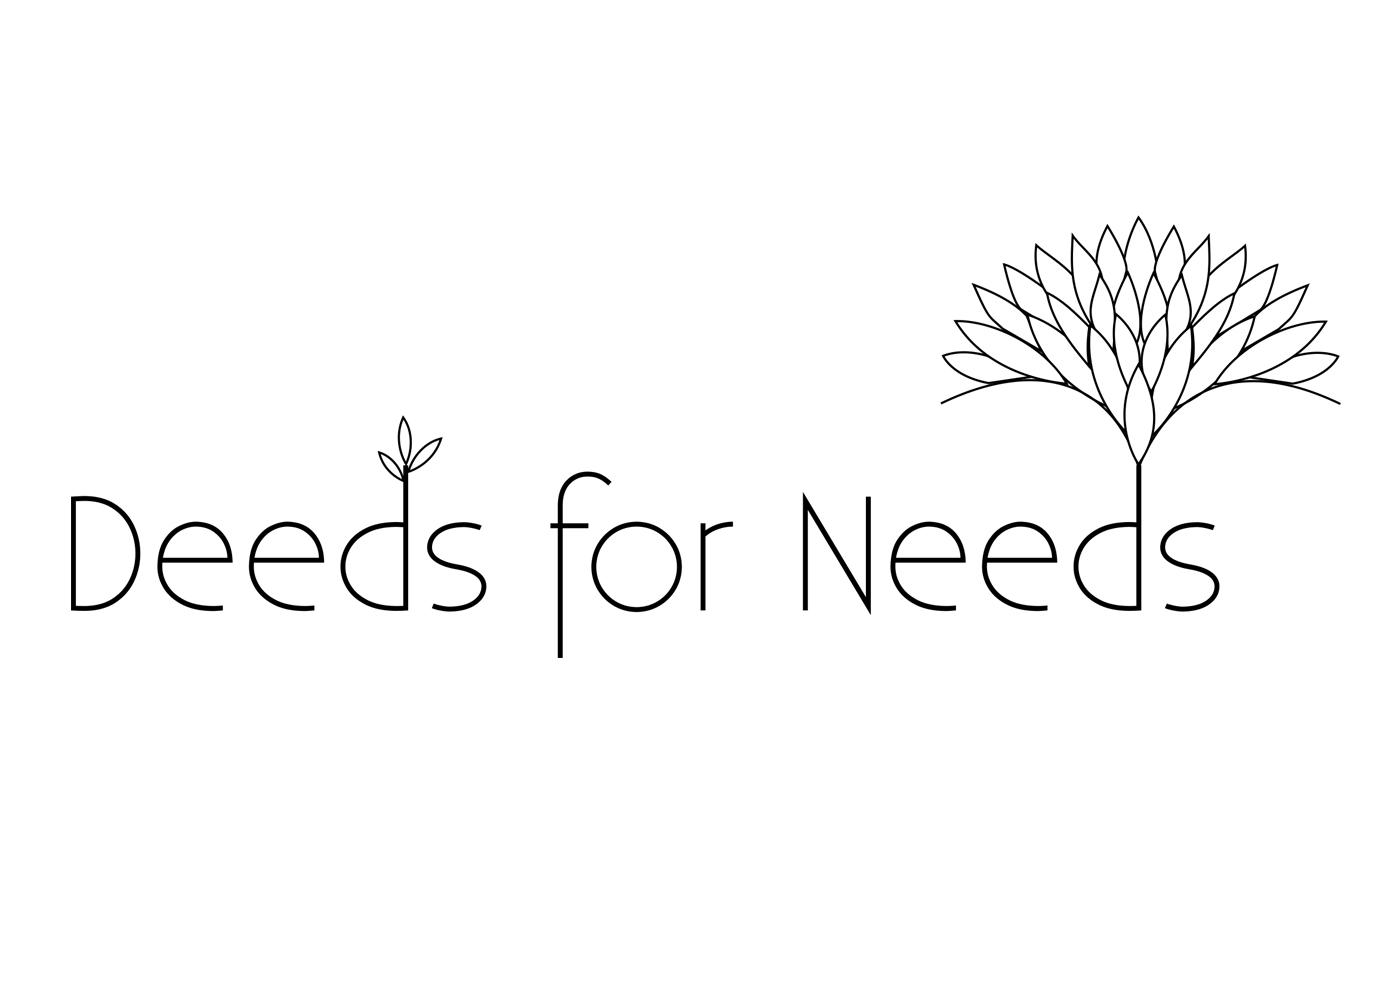 deeds logo.jpg